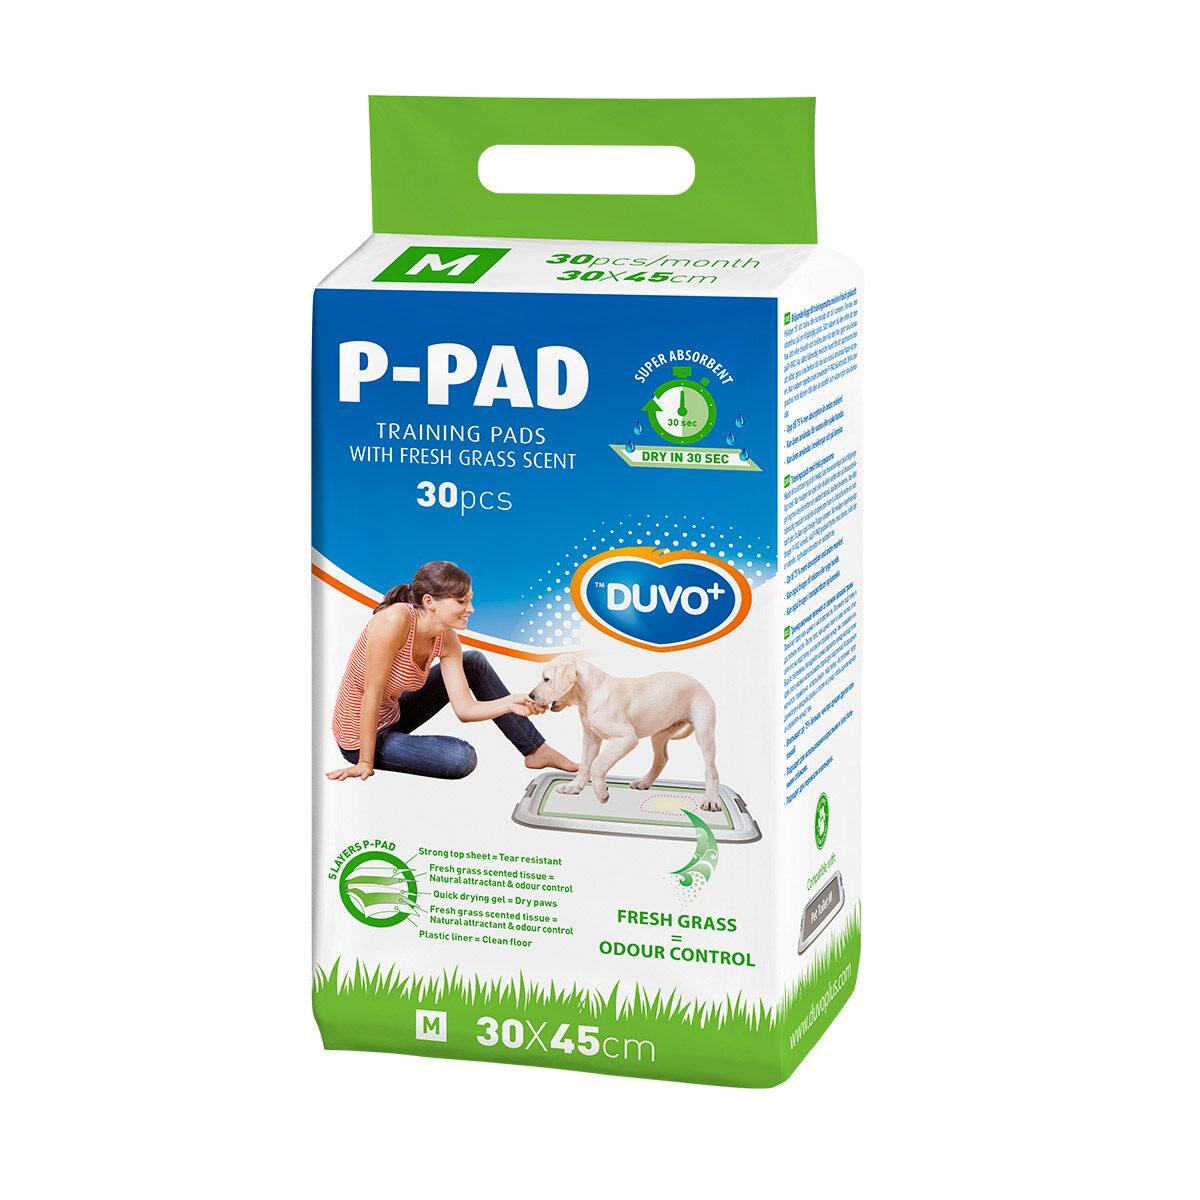 Duvo+ Puppy Training Pads Fresh Grass M 30x45cm - in Trainingshulpen